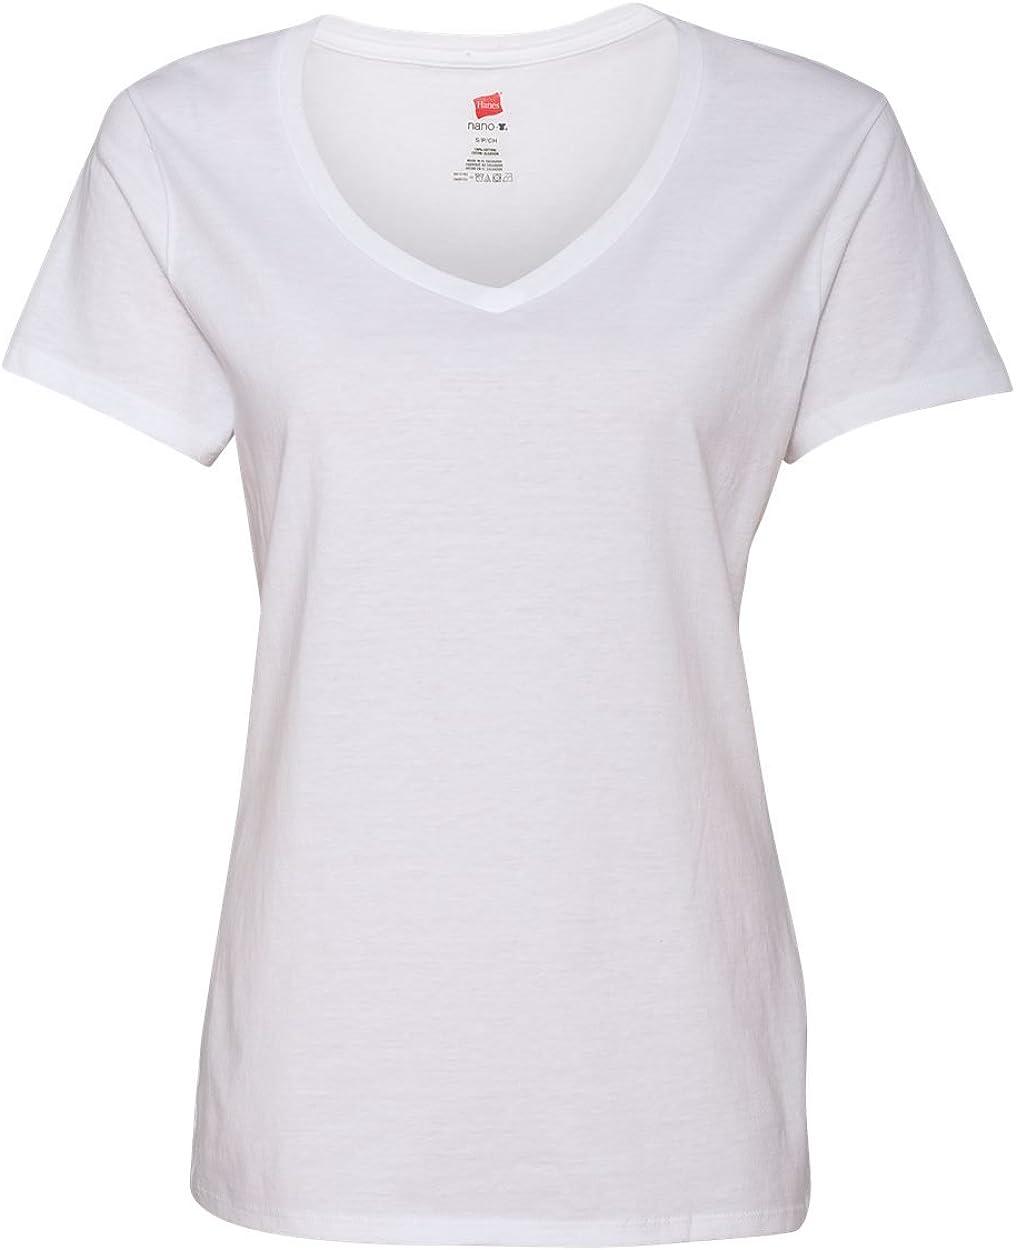 Hanes Women's Nano-T V-Neck T-Shirt at  Women's Clothing store